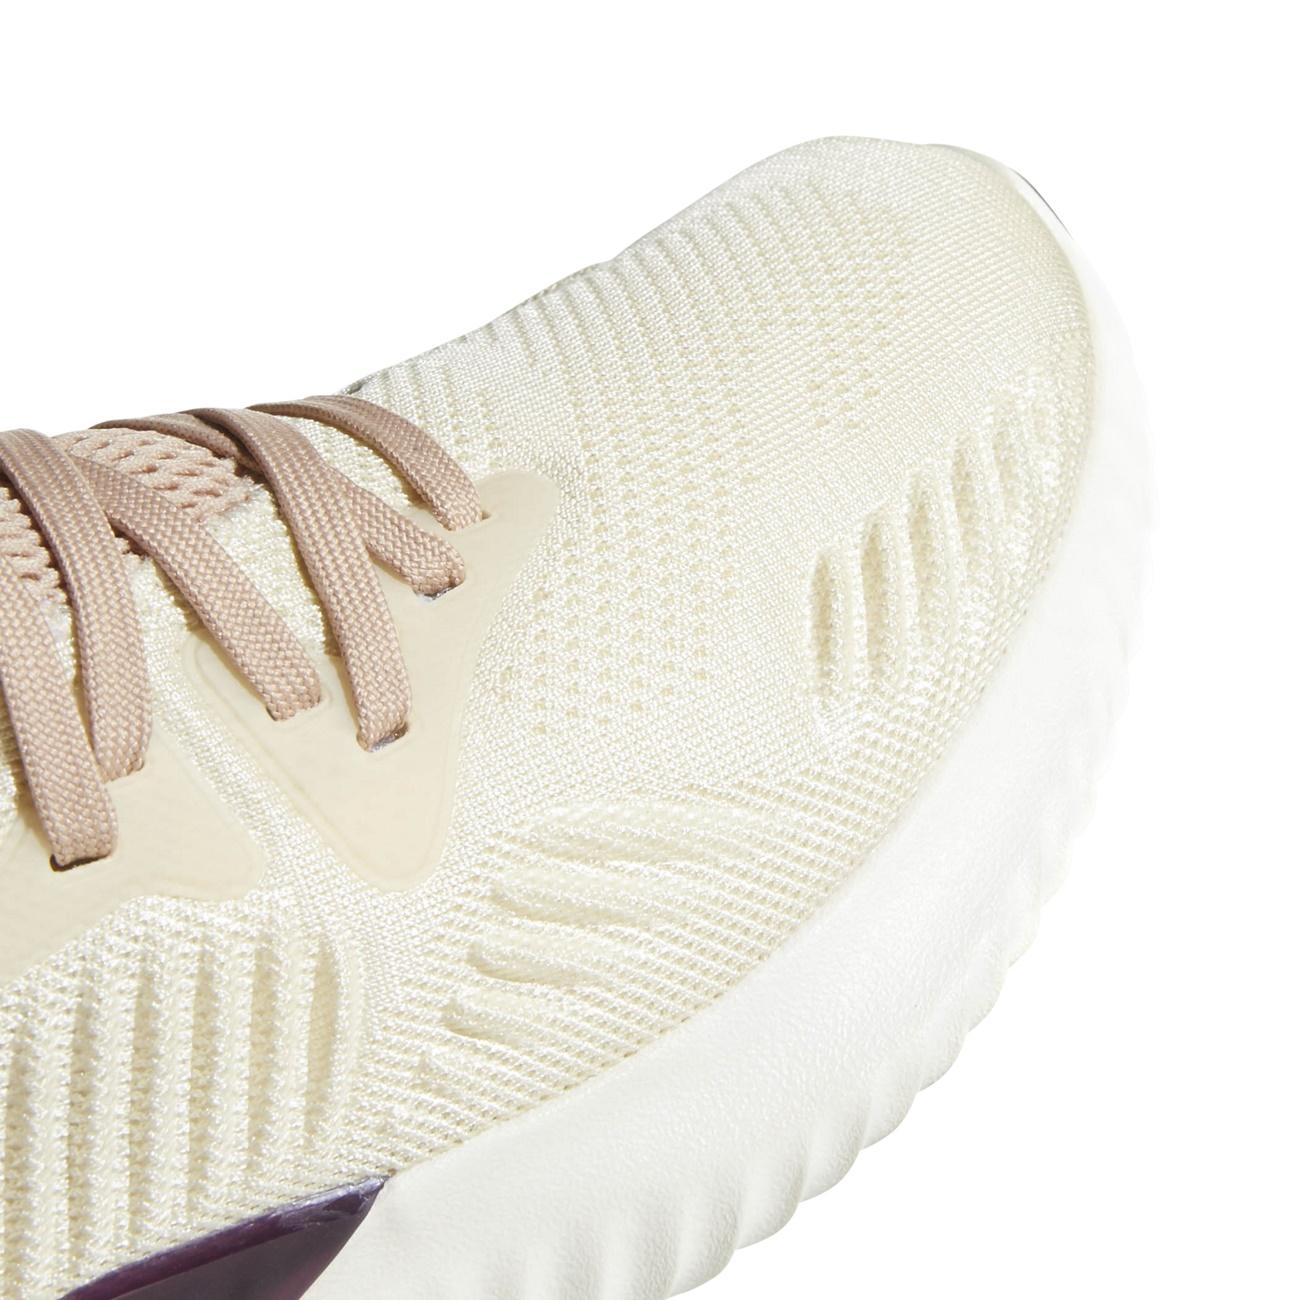 6a051b86a Adidas Alphabounce Beyond W